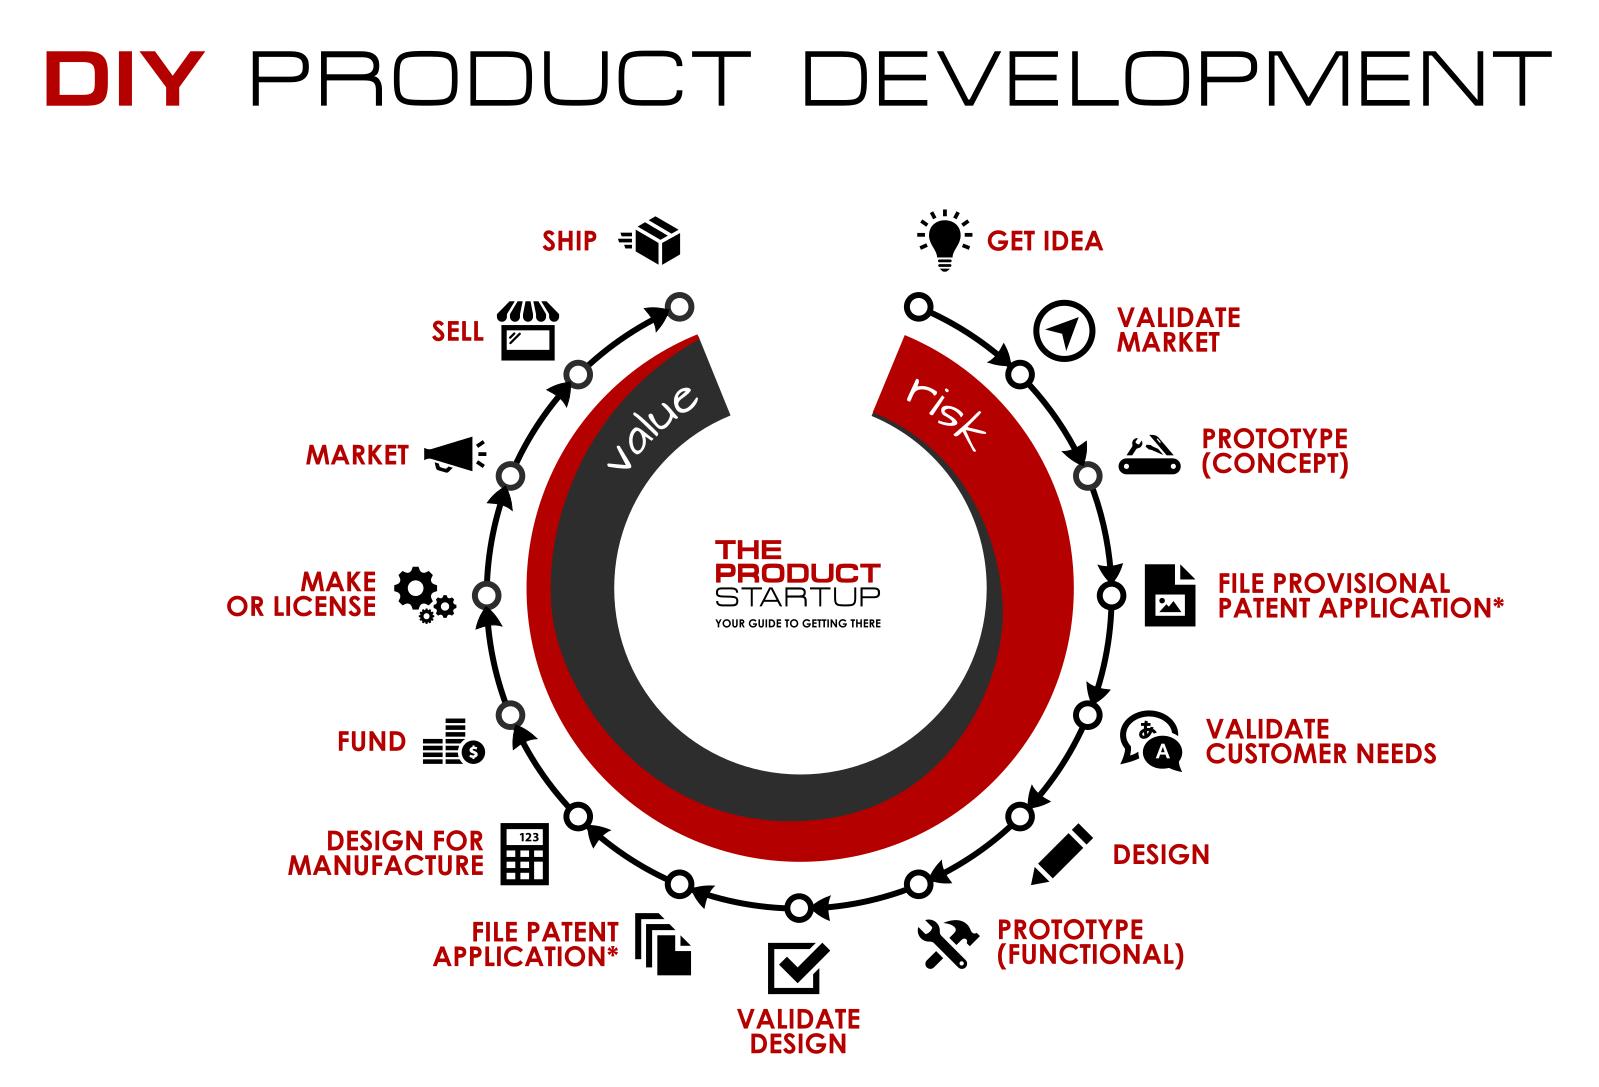 DIY amazon product development cycle